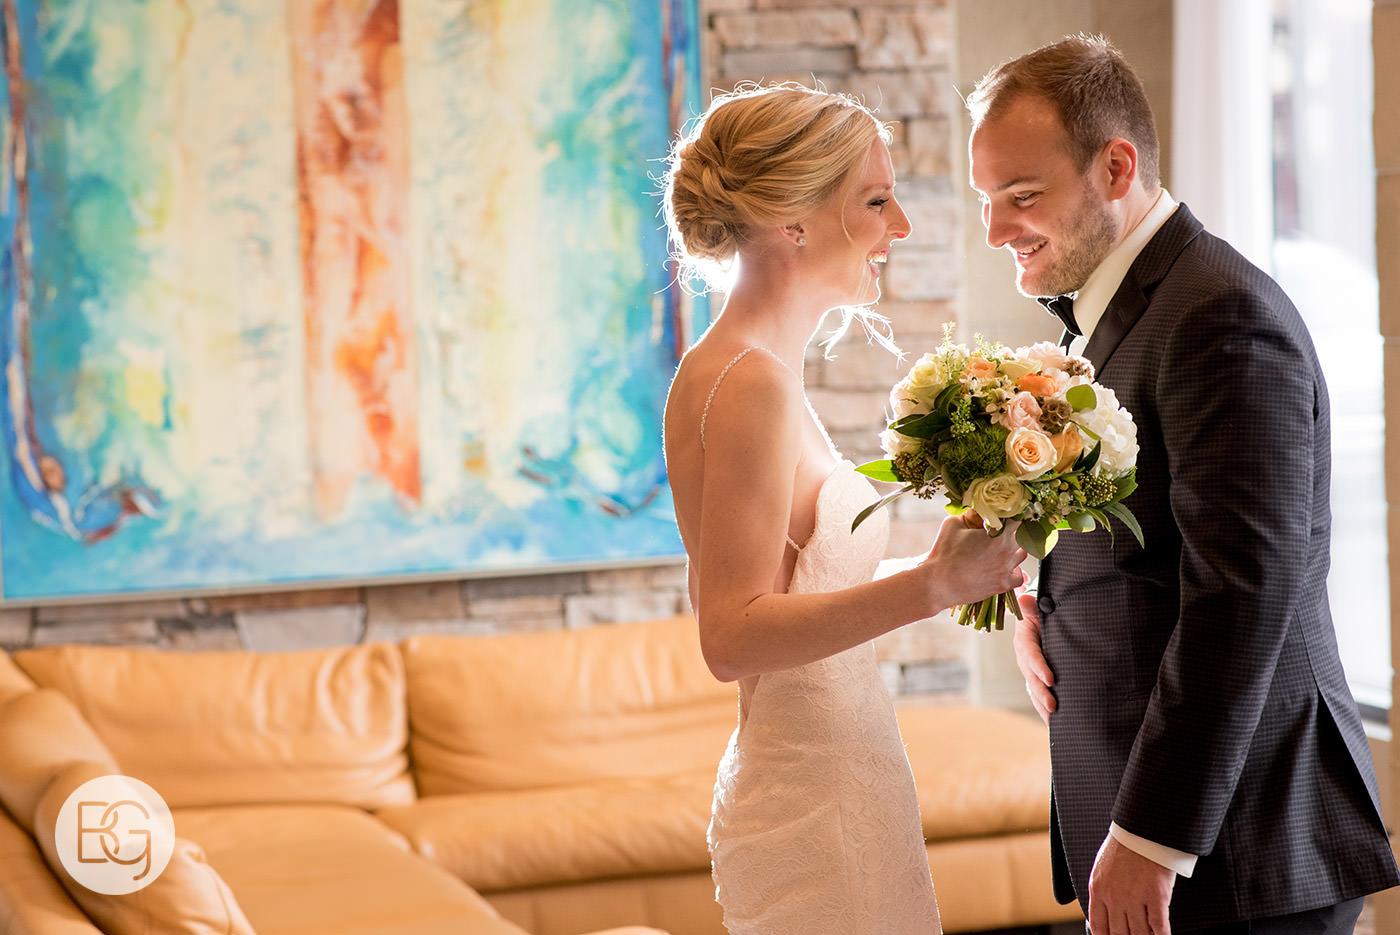 Edmonton_wedding_photographers_josh_sara_whyte_13.jpg